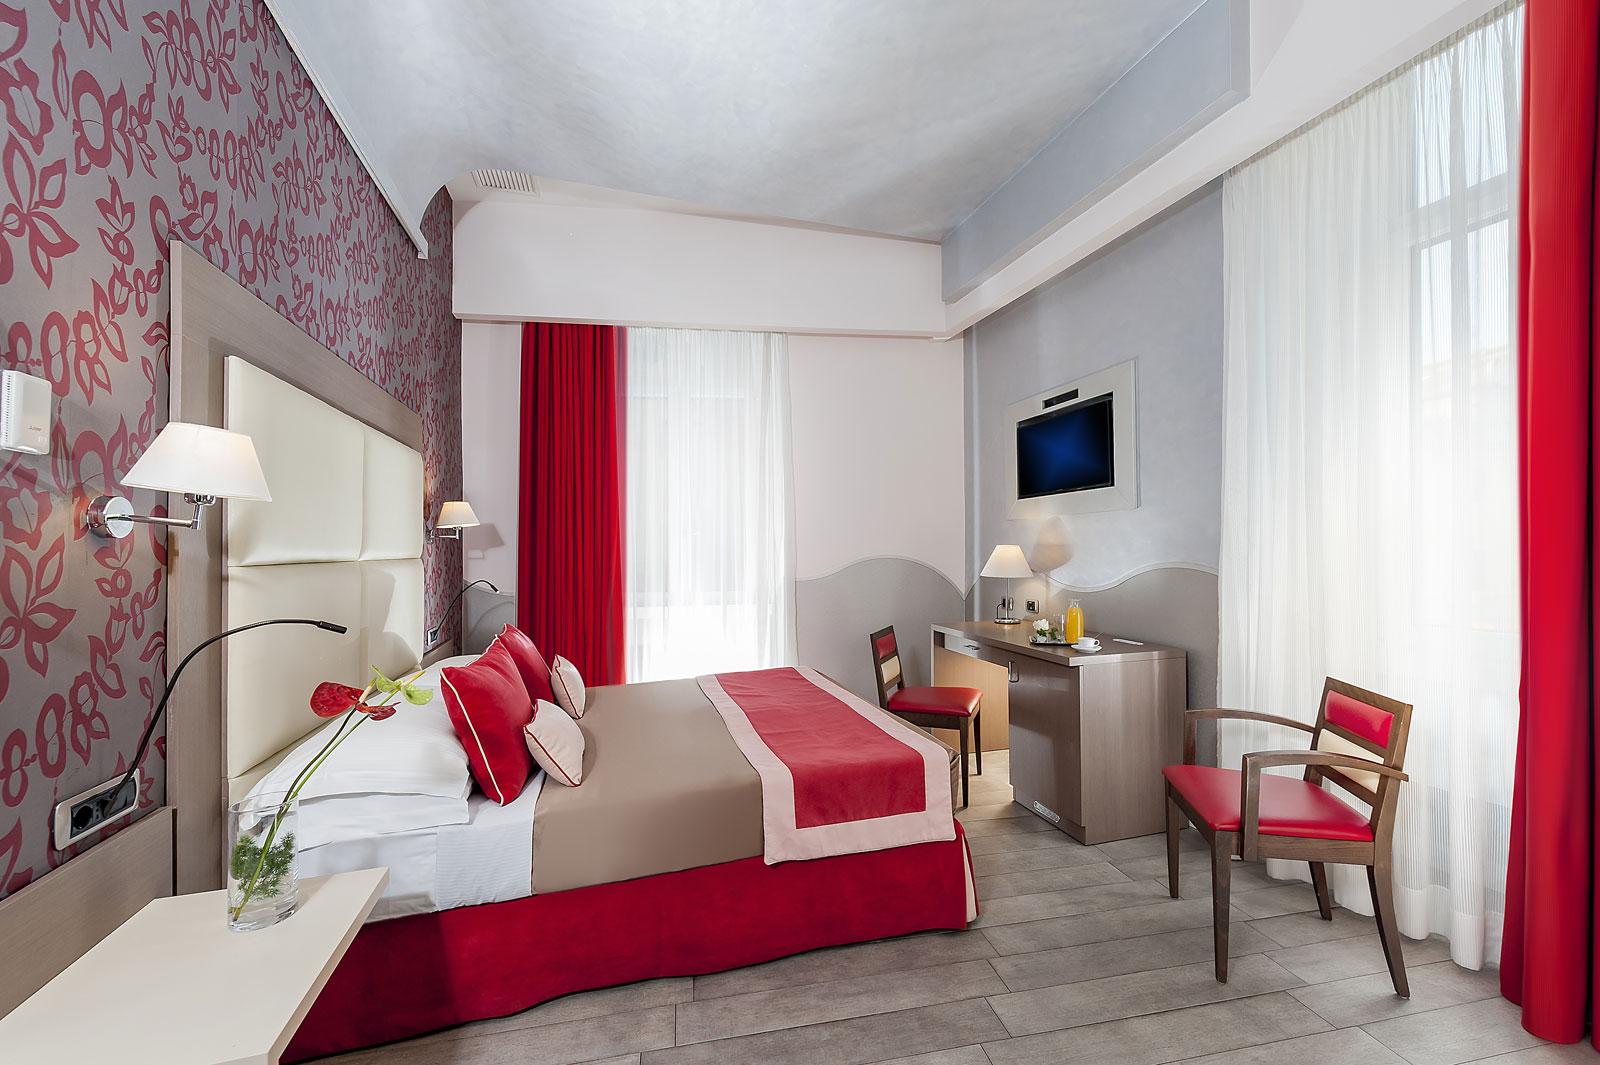 Camera matrimoniale hotel roma camera matrimoniale roma - Camera matrimoniale romantica ...